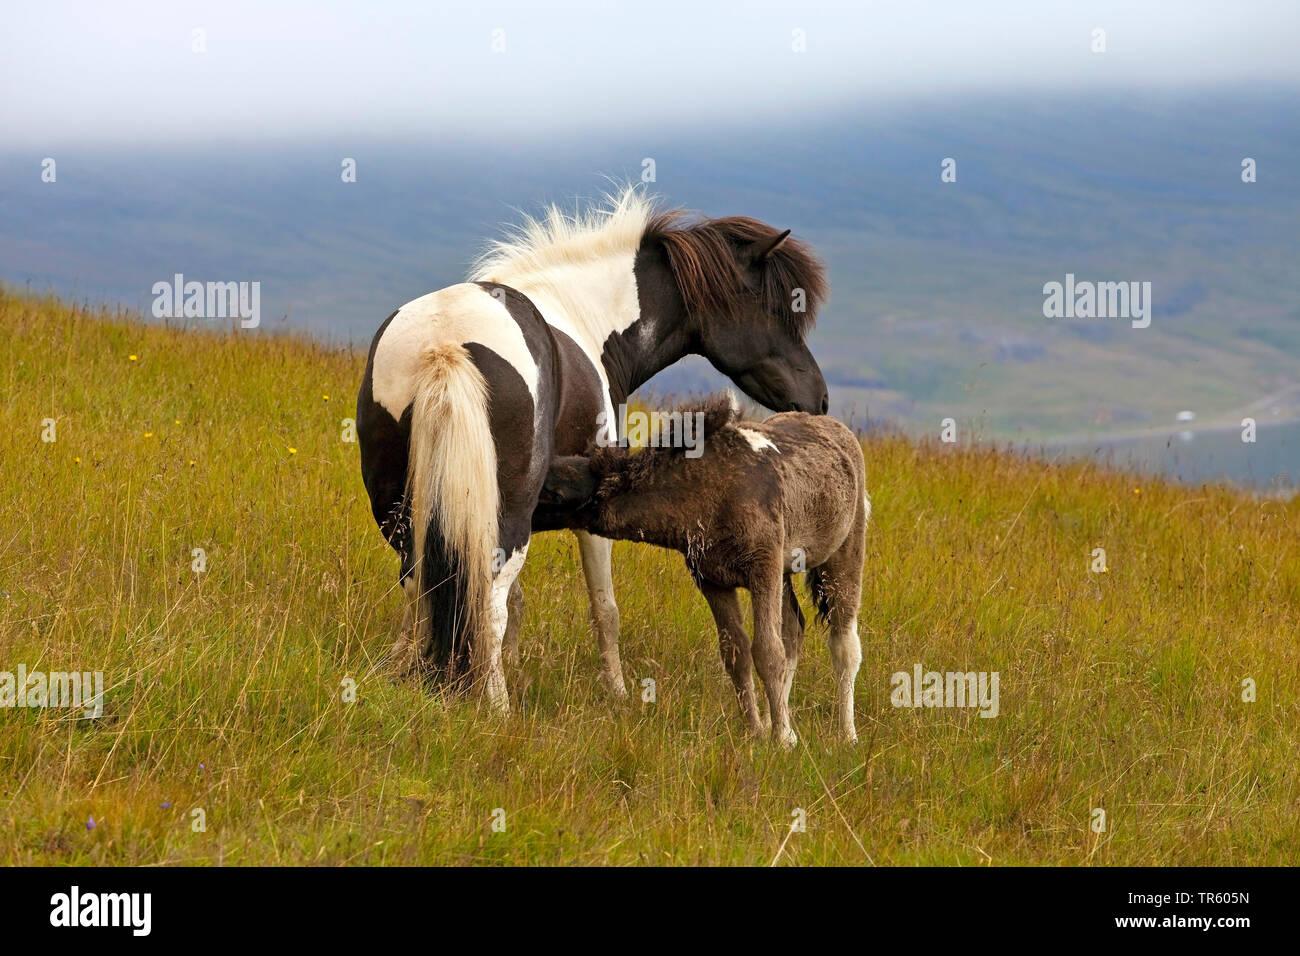 Islandpferd, Islandpony, Islaender (Equus przewalskii f. caballus), grasende Islandpferde, Stute saeugt Fohlen, Island, Ostisland, Seydisfjoerdur   Is - Stock Image